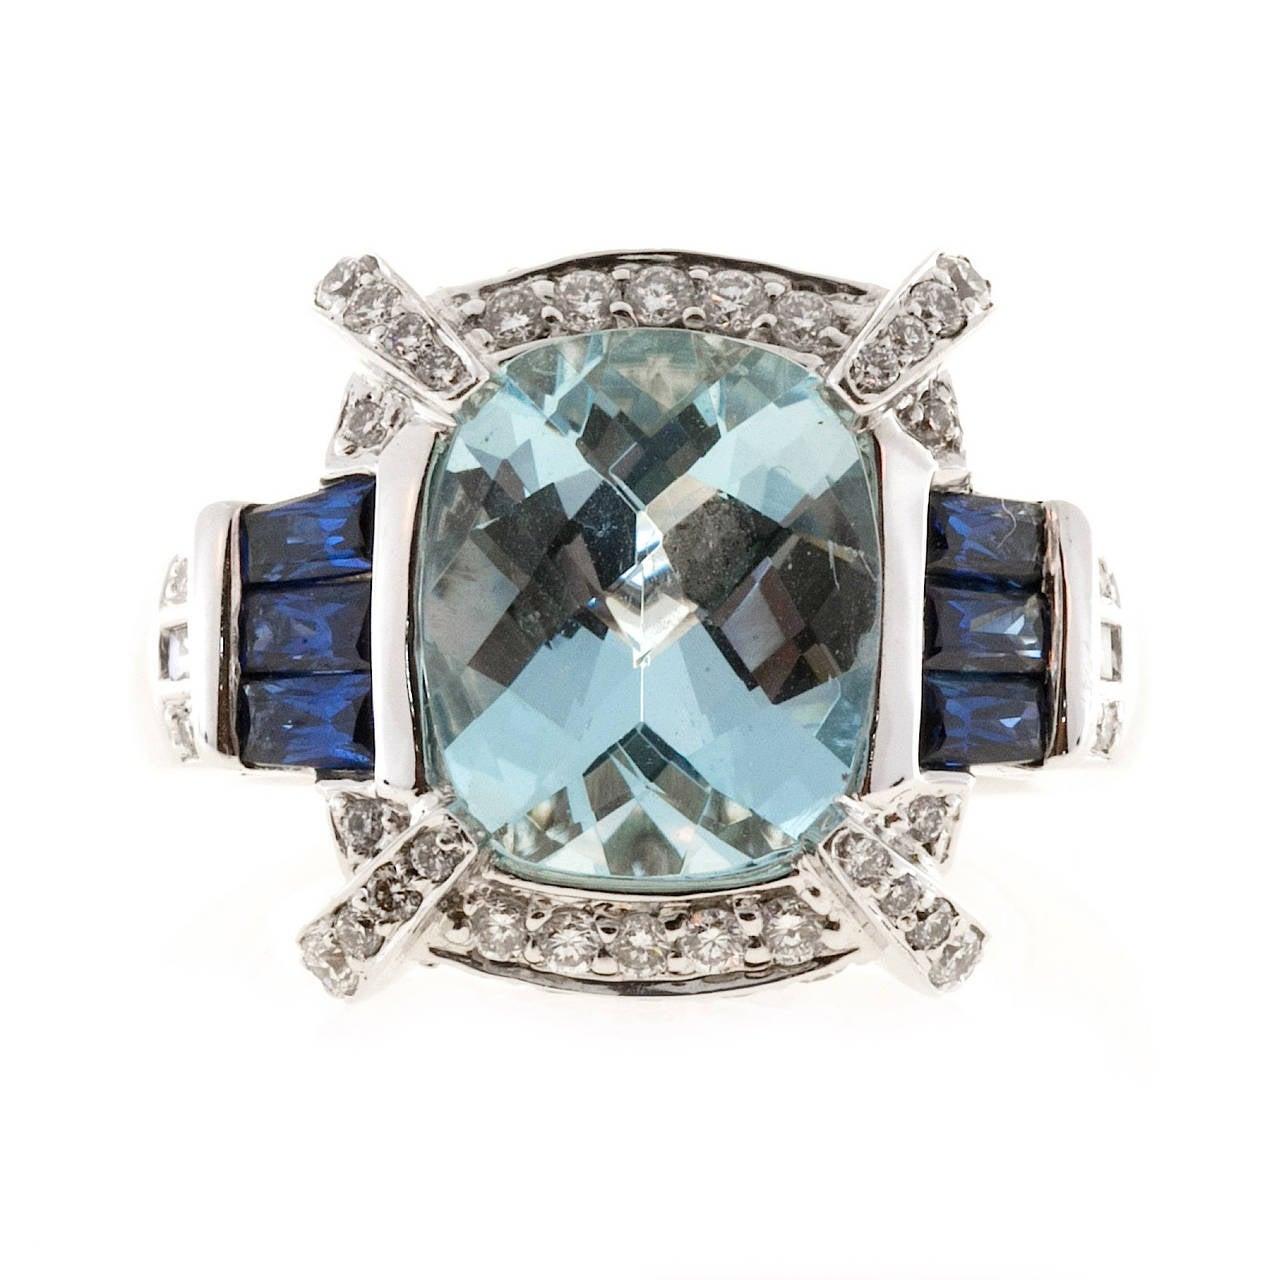 Charles Krypell Aquamarine Sapphire Diamond Gold Cocktail Ring 6